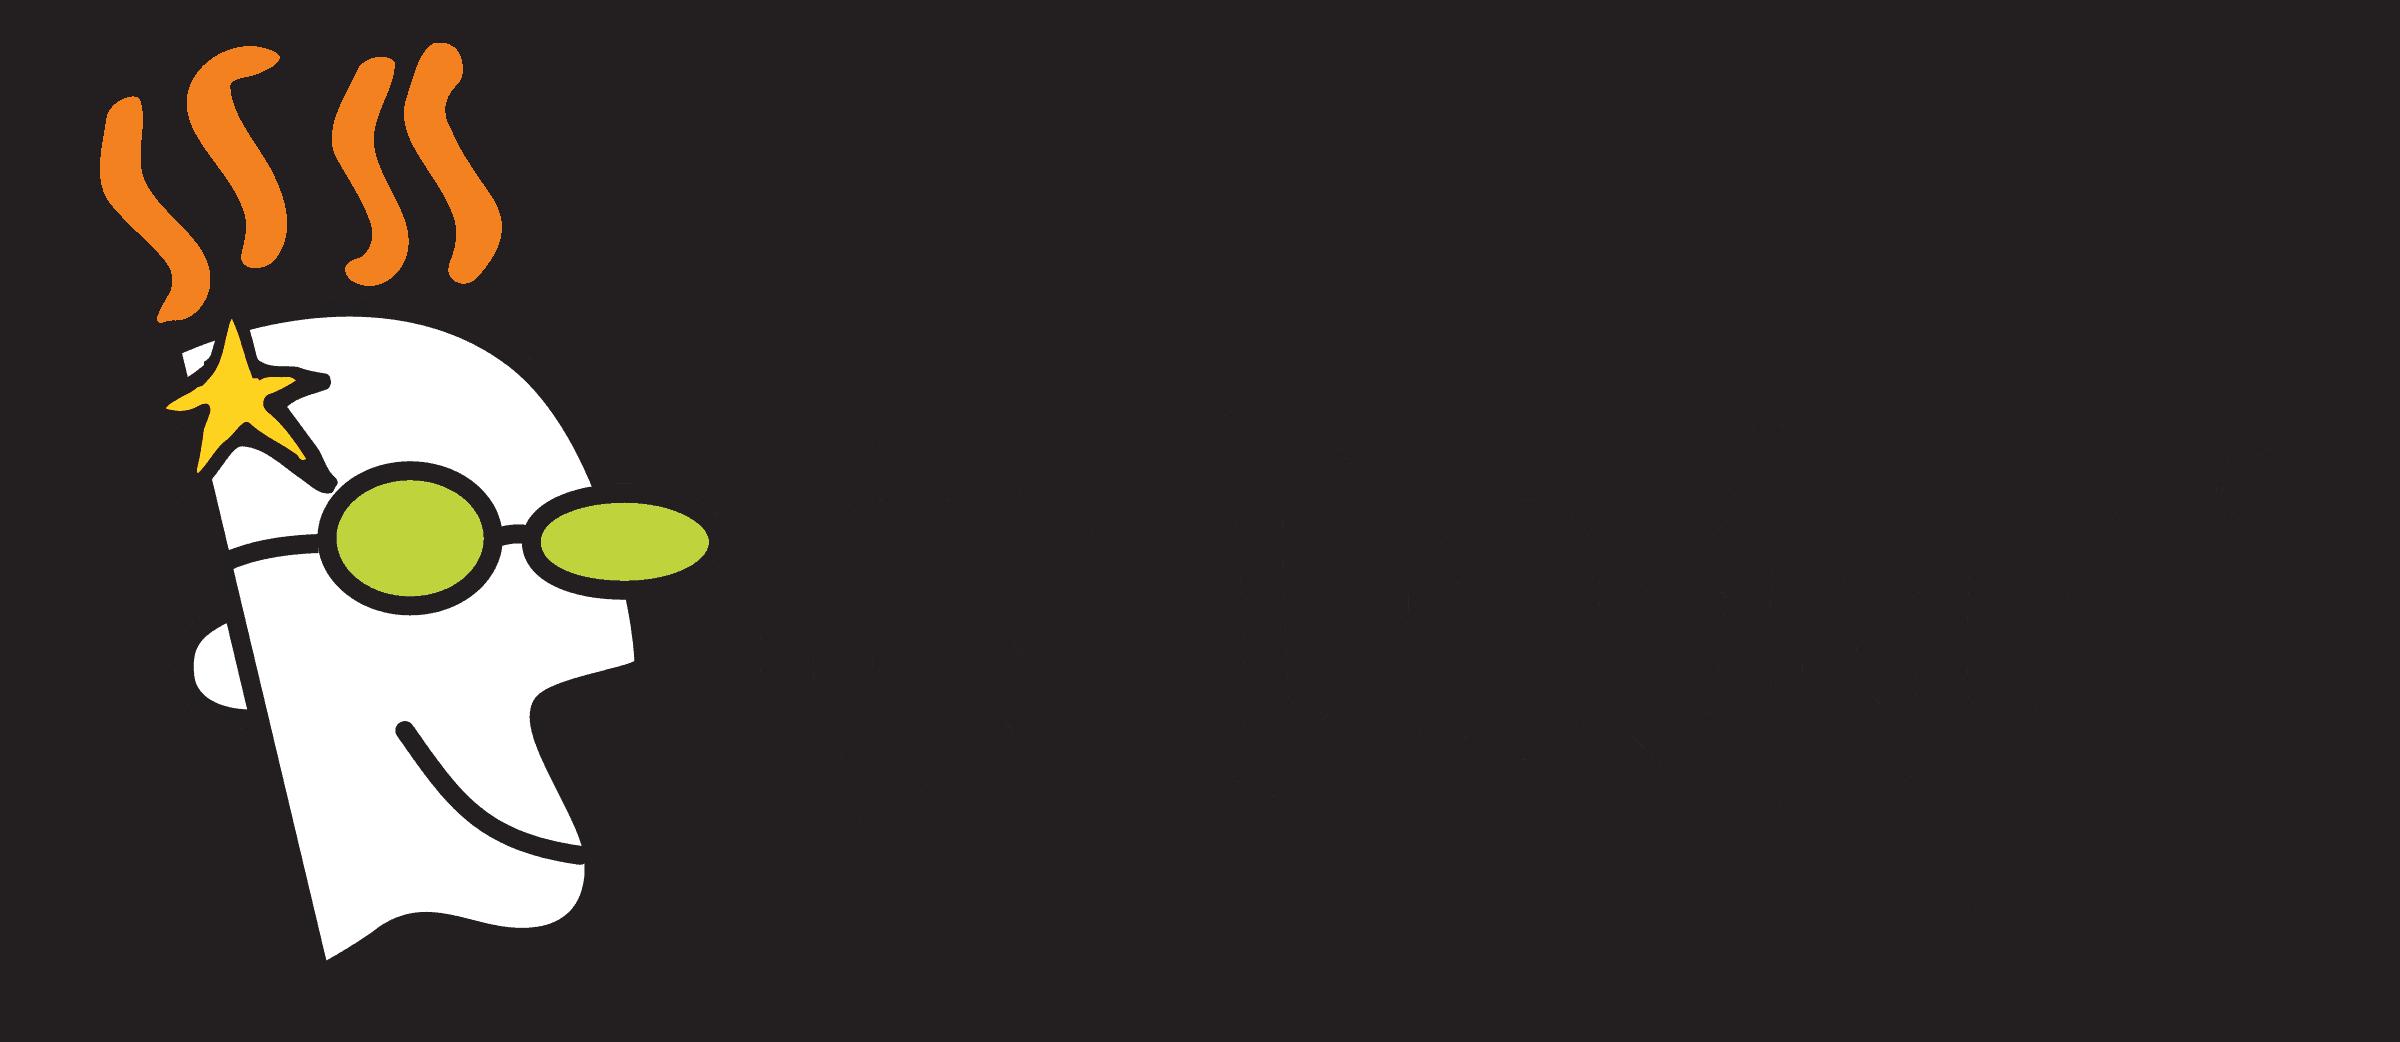 godaddy-logo-transparent